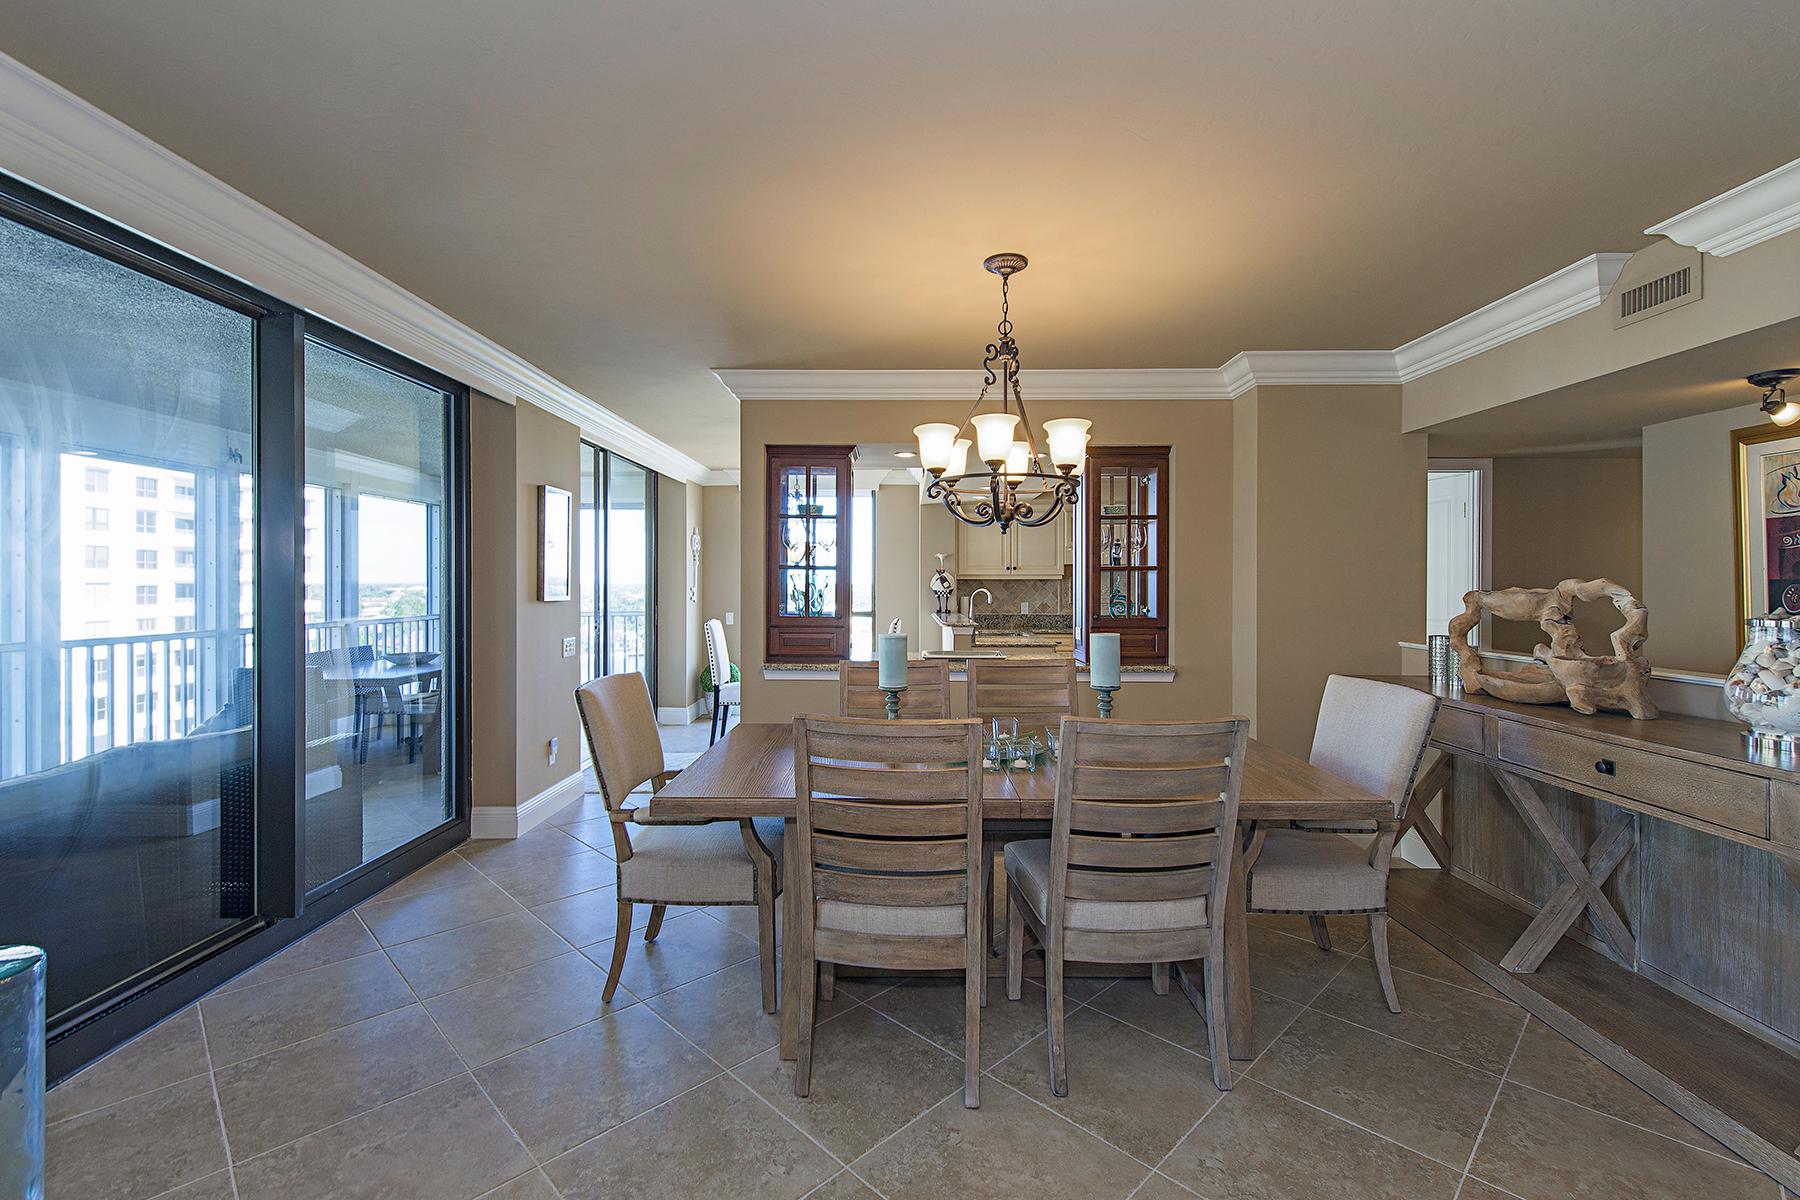 Кооперативная квартира для того Продажа на PARK SHORE - MONACO BEACH CLUB 4401 Gulf Shore Blvd N 1006 Naples, Флорида, 34103 Соединенные Штаты